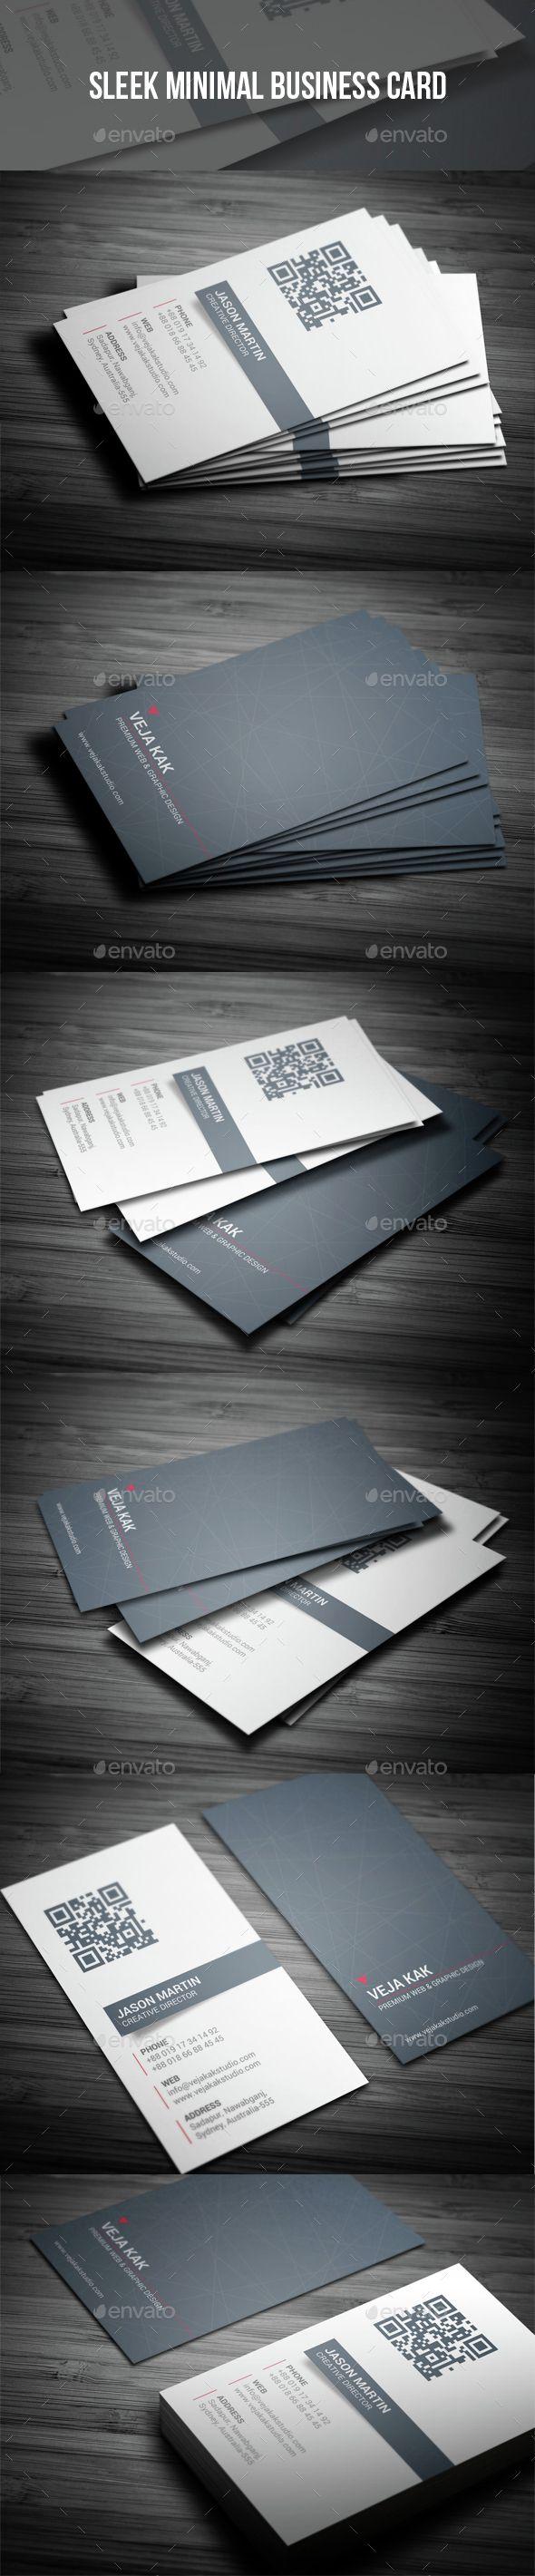 sleek minimal business card